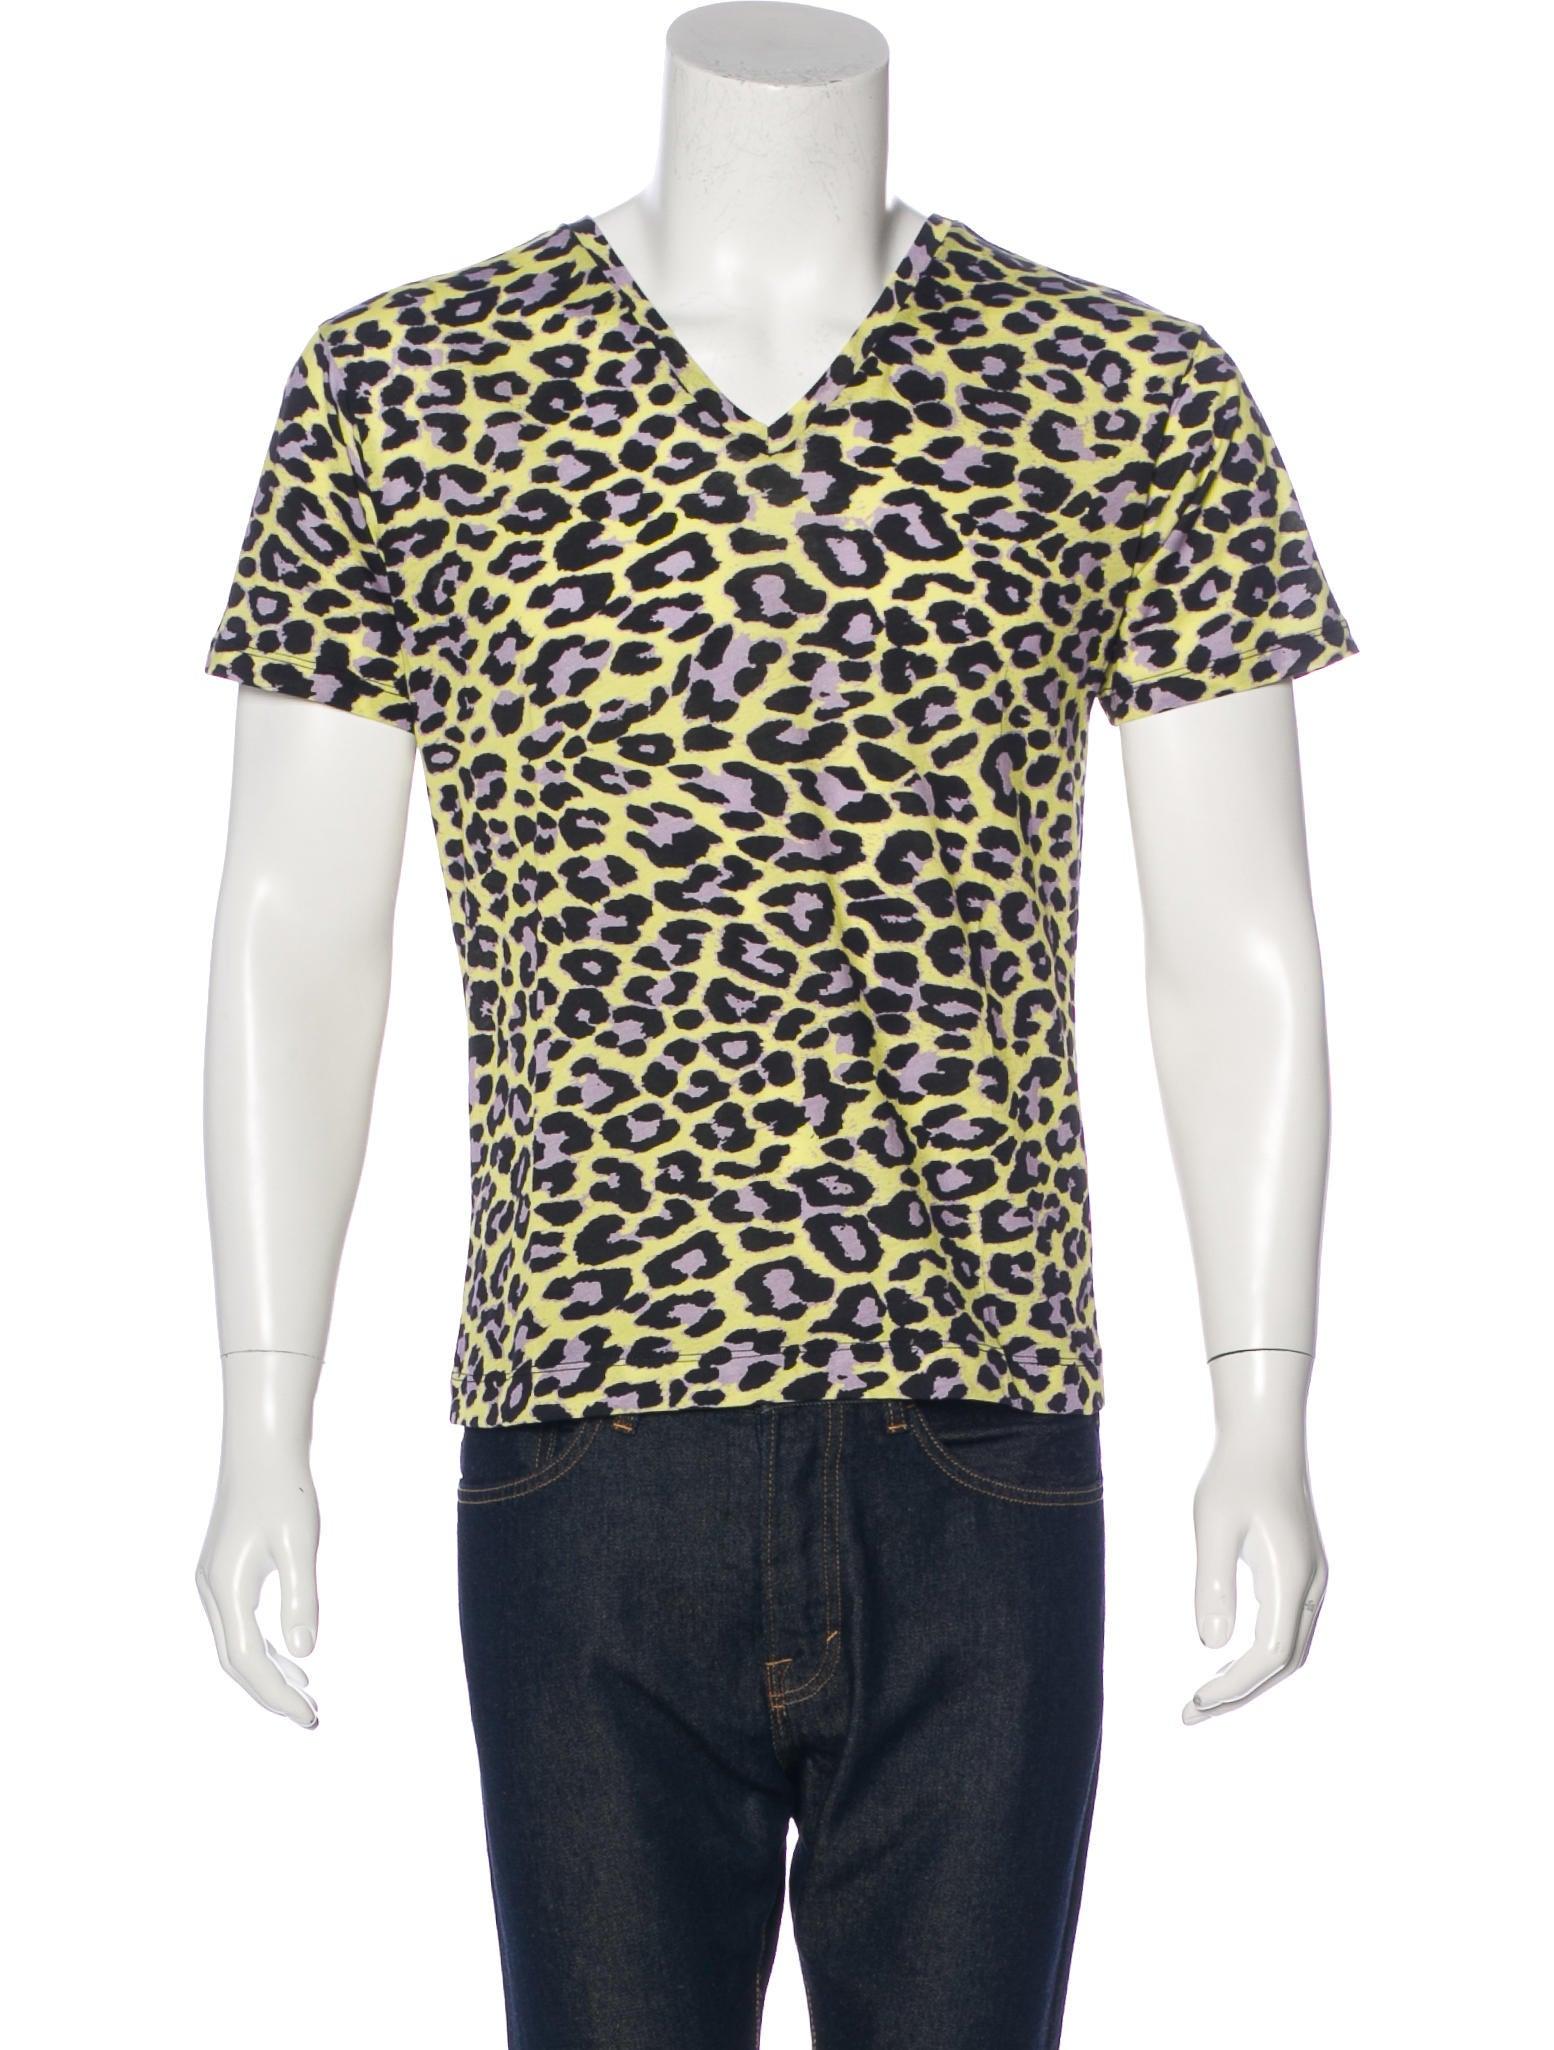 Dries Van Noten Leopard Print T-Shirt w/ Tags - Clothing - DRI38910 | The RealReal